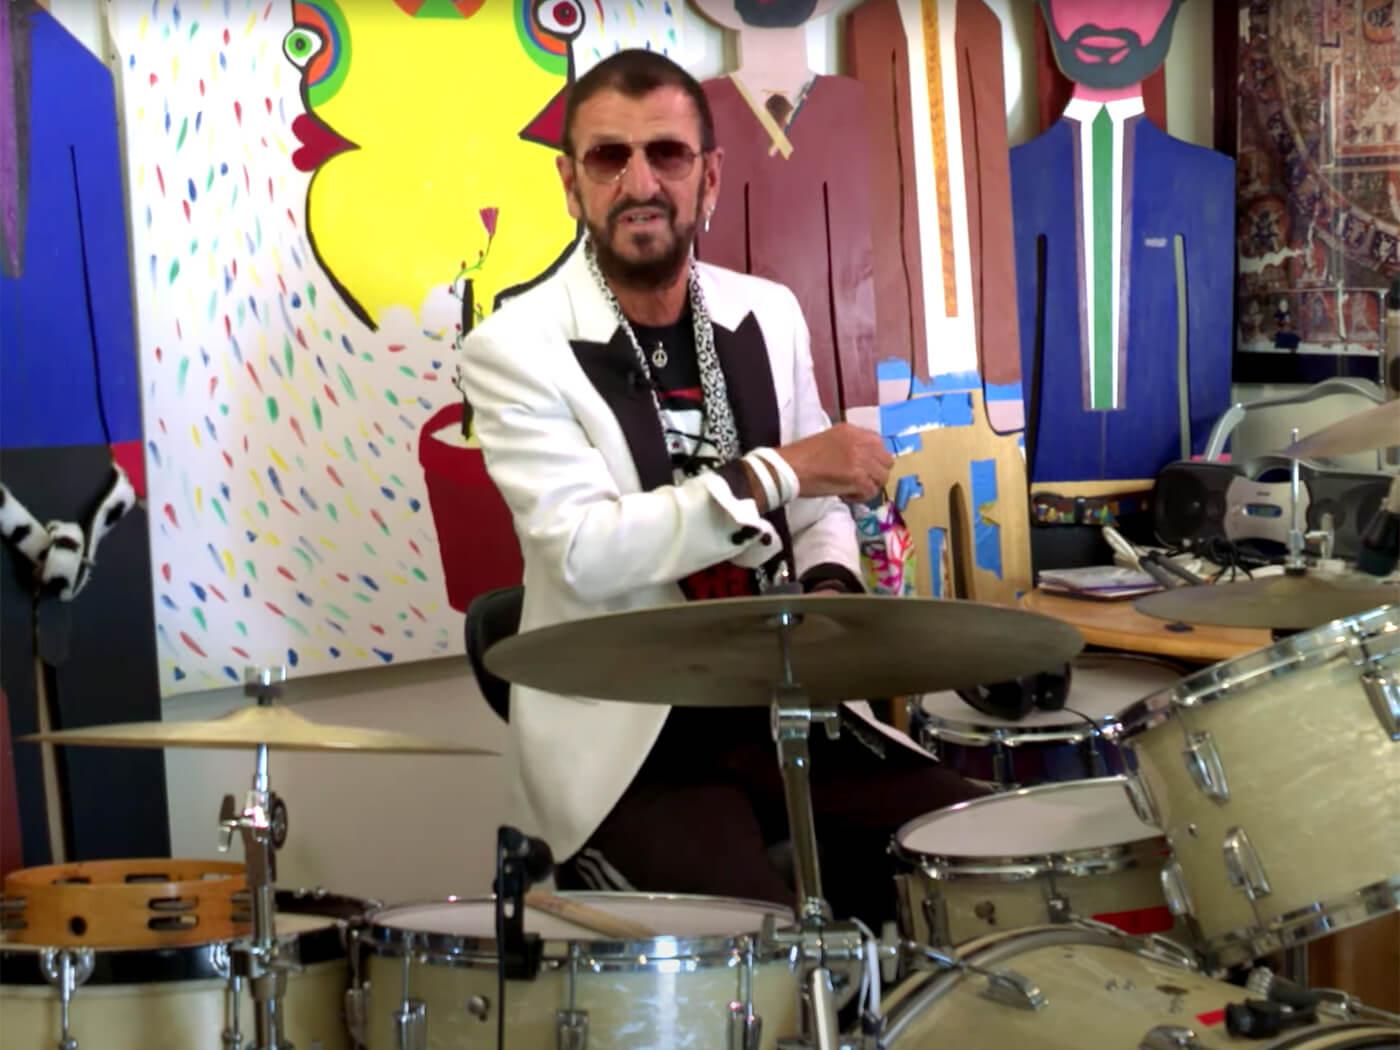 Watch Ringo Starr's 80th birthday livestream